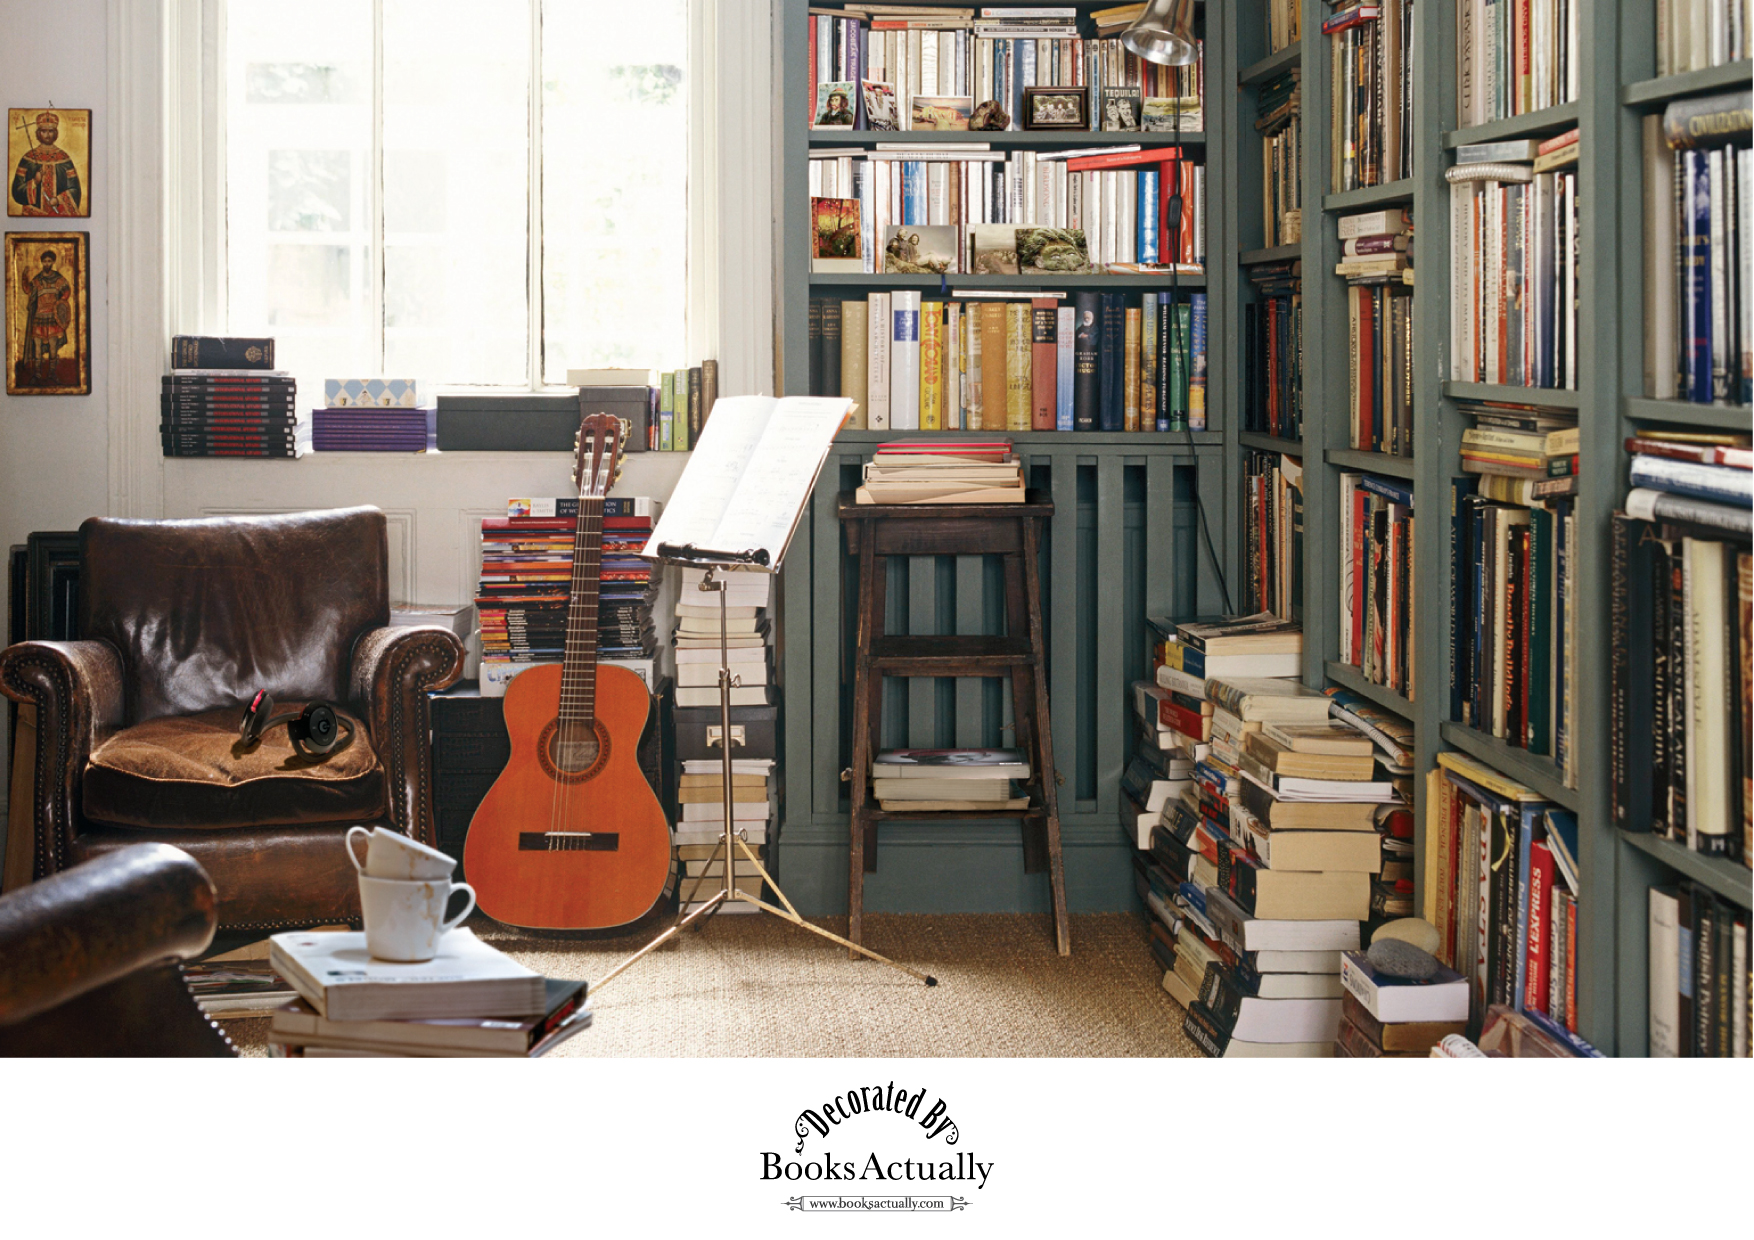 BooksActually-03.jpg